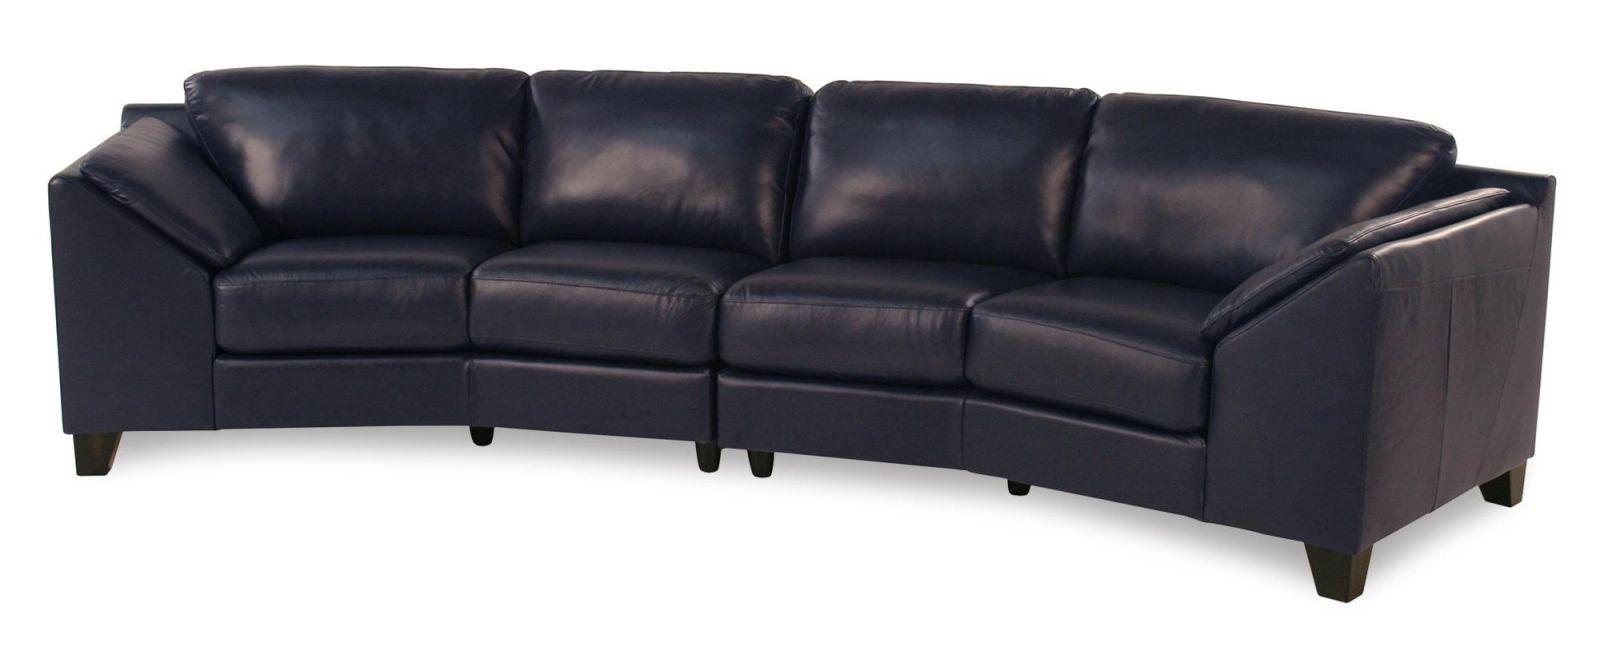 Regatta Contemporary Leather Sectional Sofa | Rotmans | Sectional Sofas pertaining to Leather Sectional Sofa